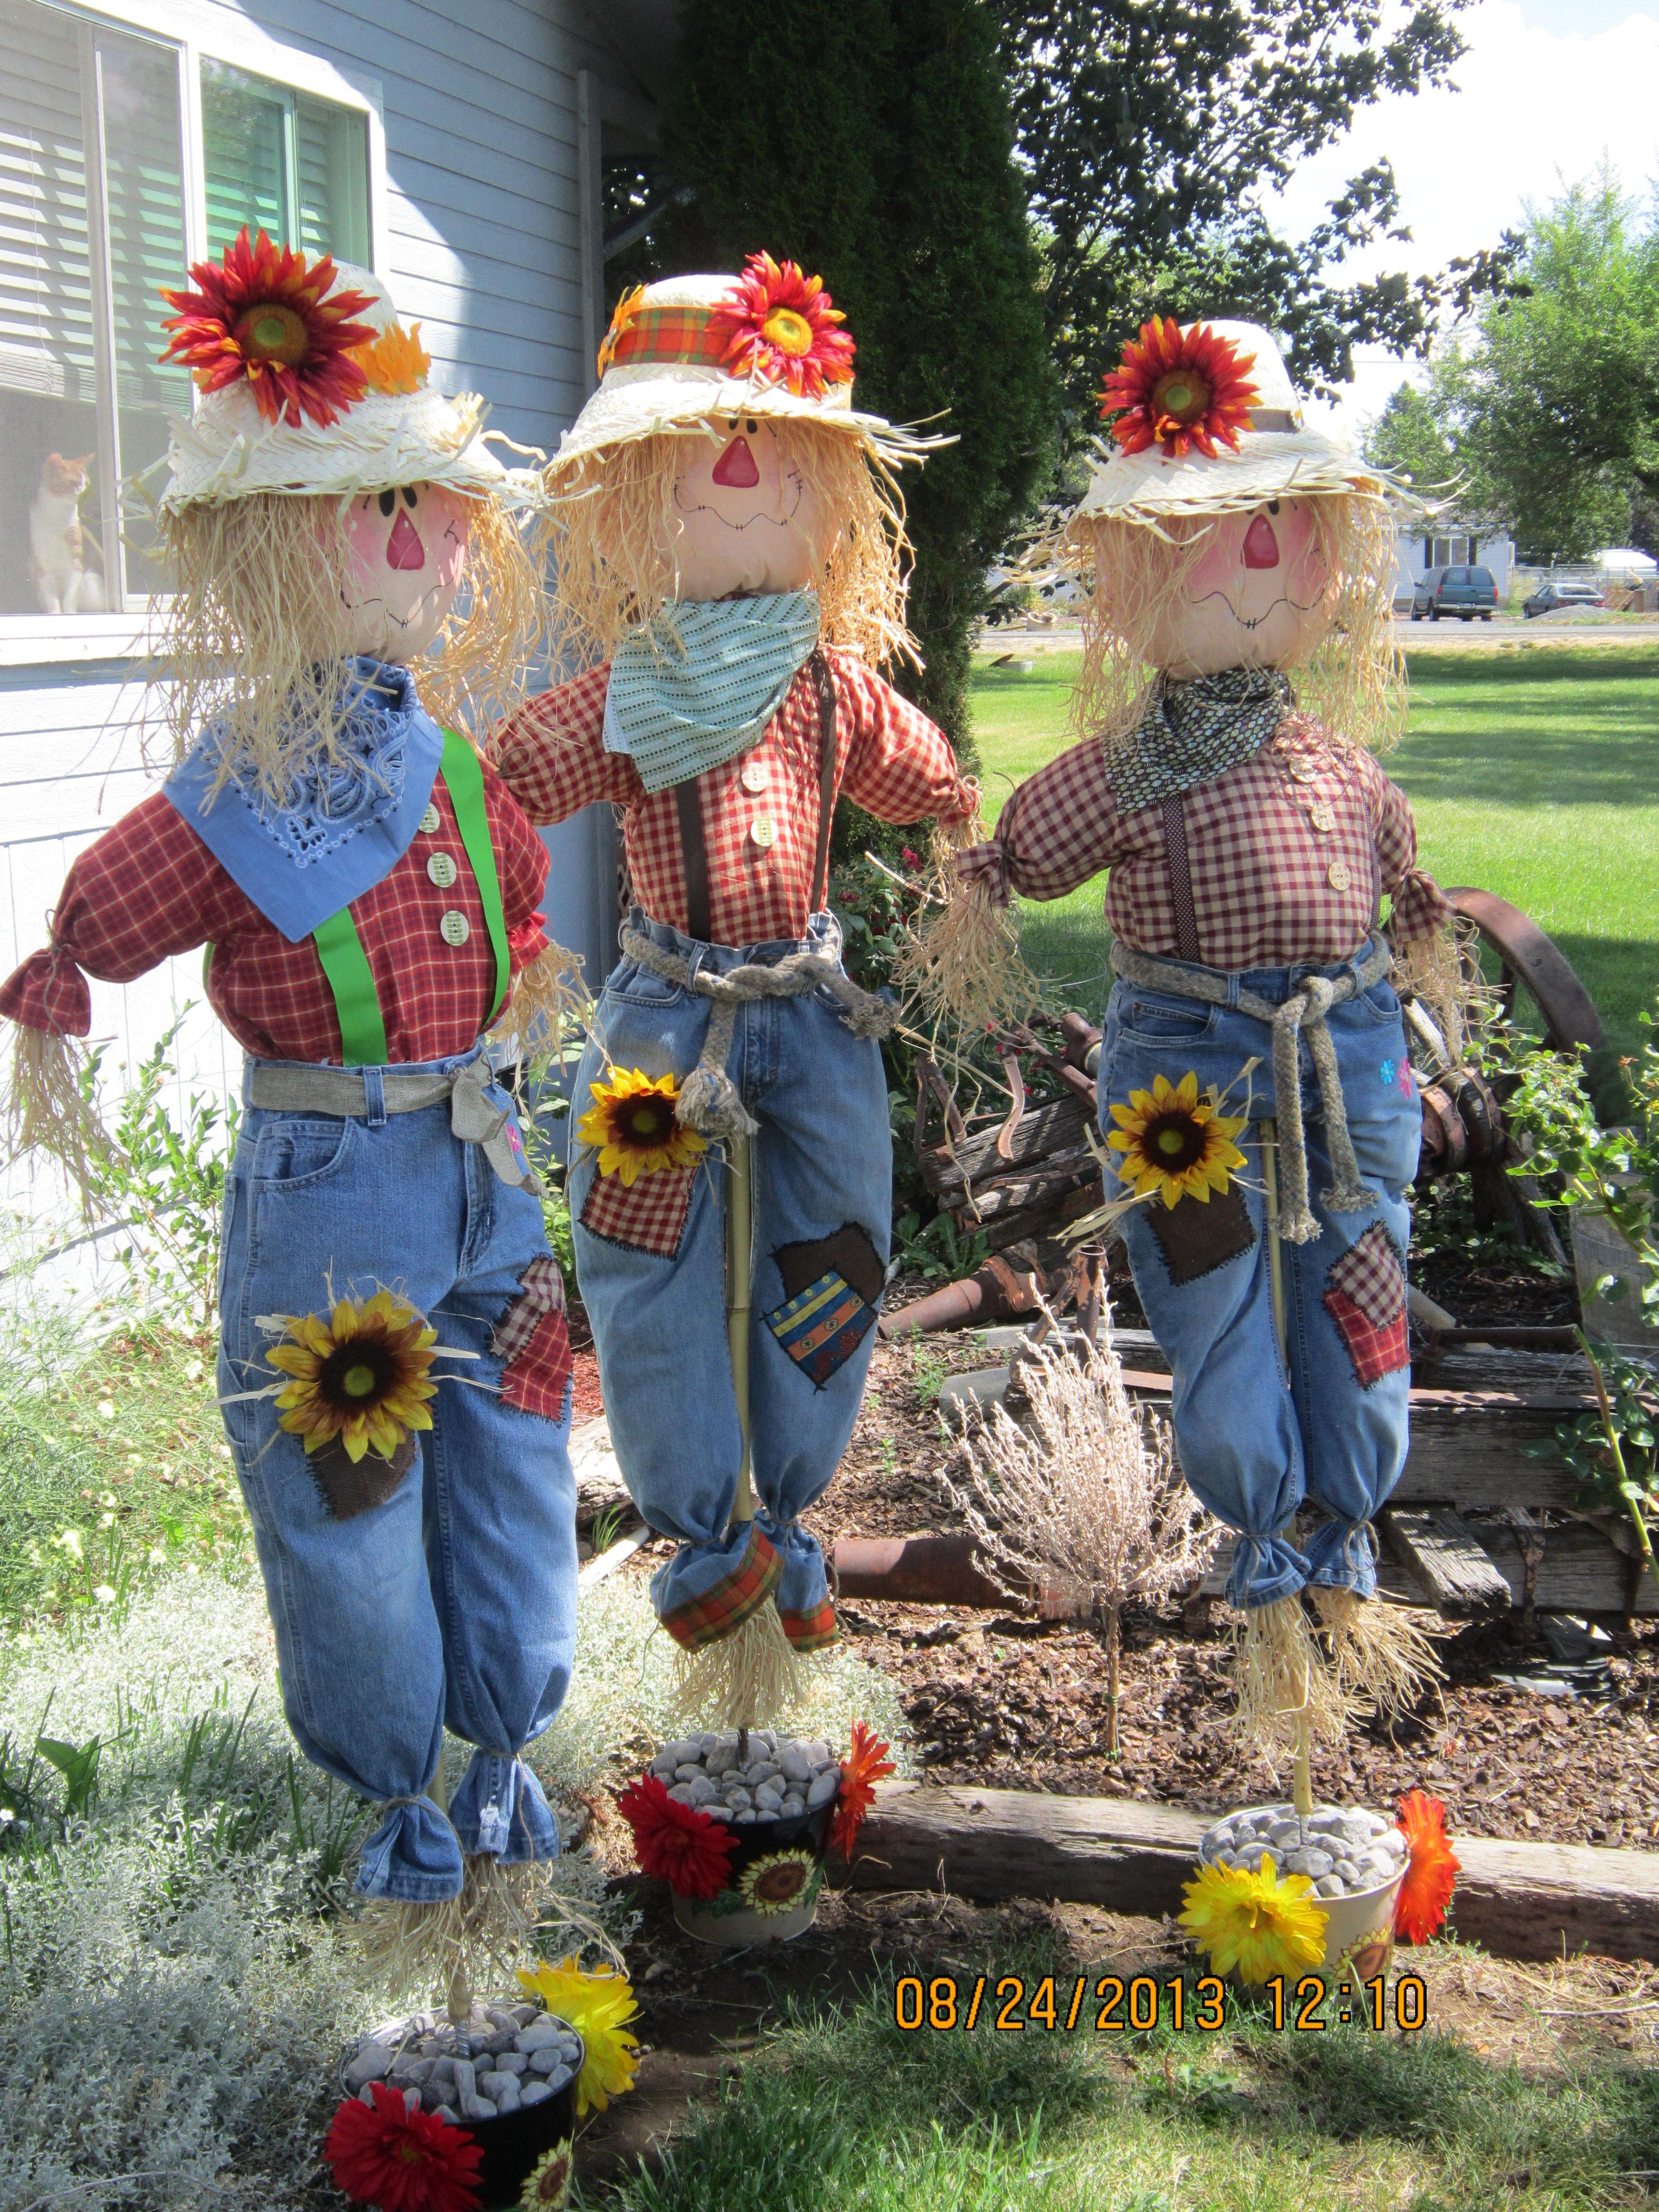 Fall scarecrows harvest decoration pinterest fall scarecrows and scarecrows - Comment faire un epouvantail ...